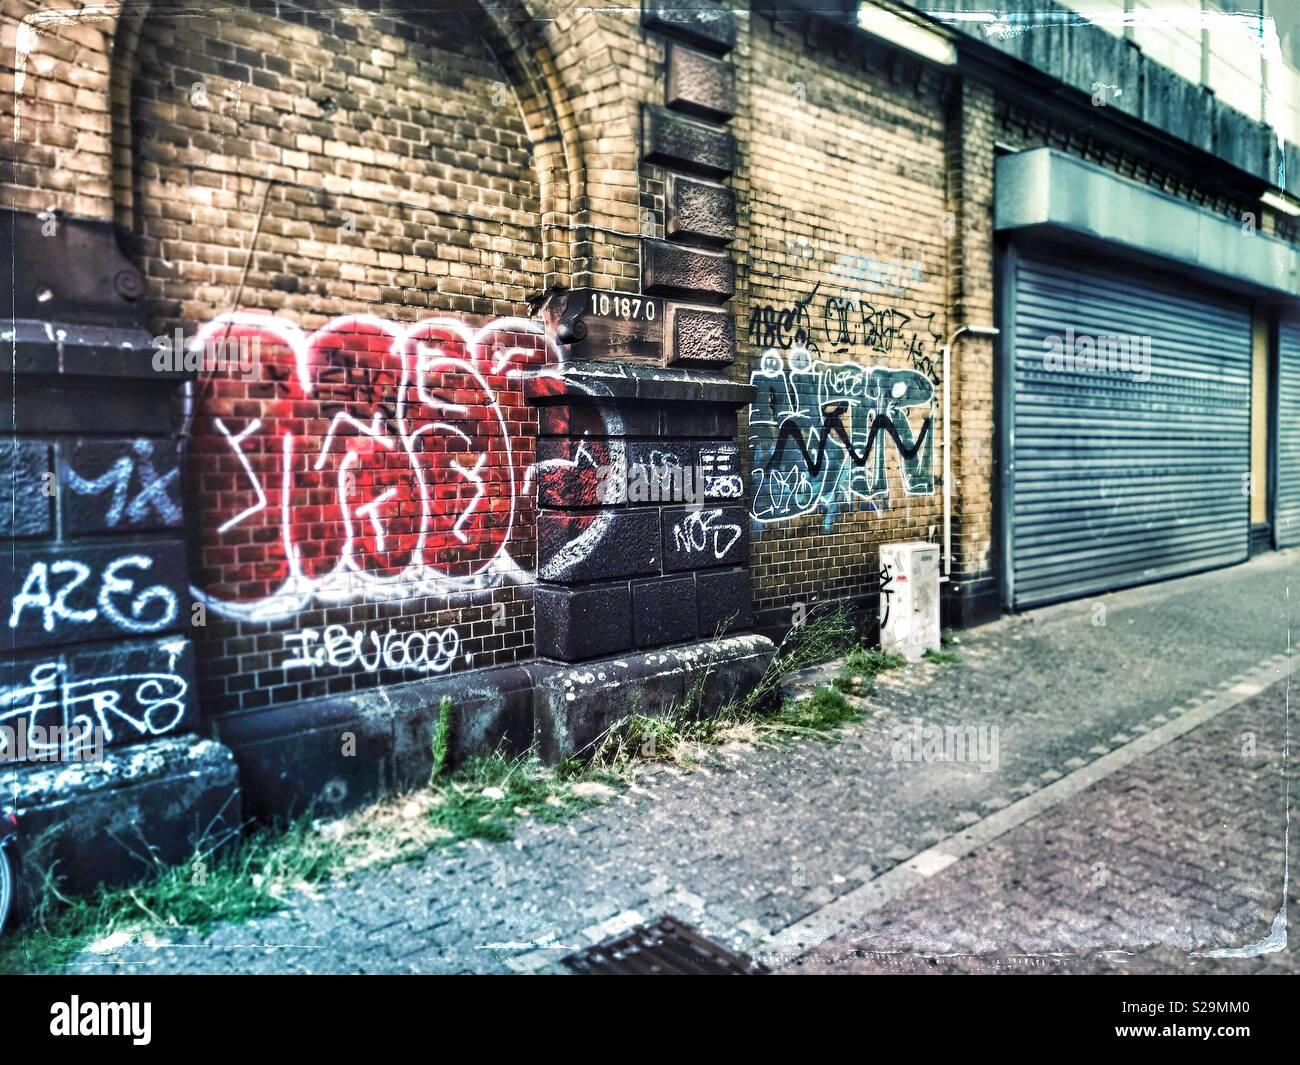 Graffiti dans Düsseldorf - Allemagne Photo Stock